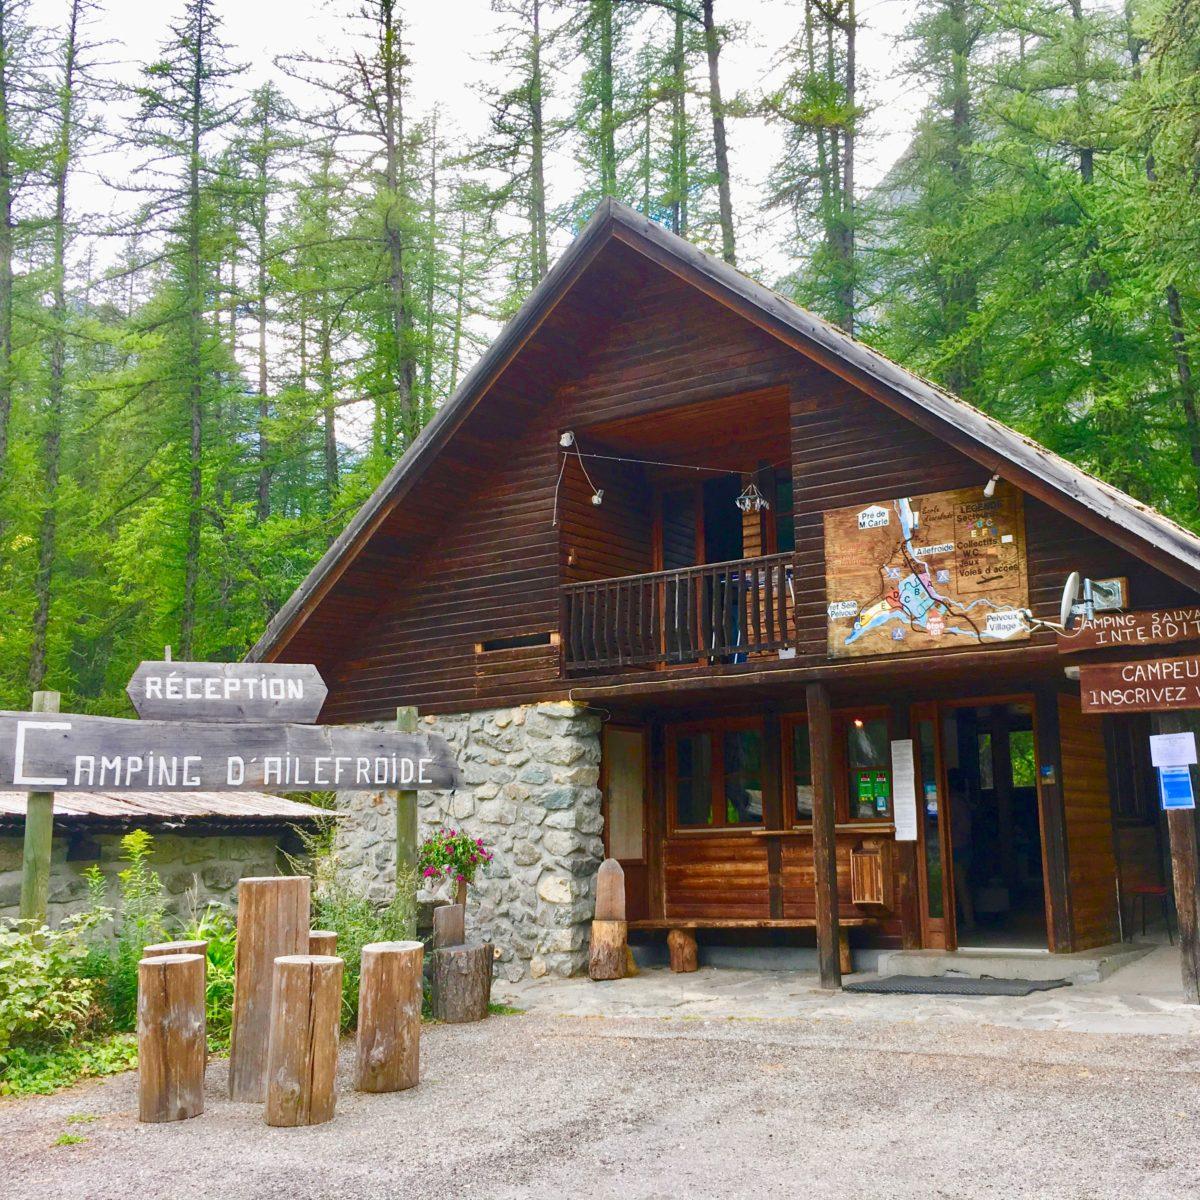 Ailefroide Campingplatz-Rezeption